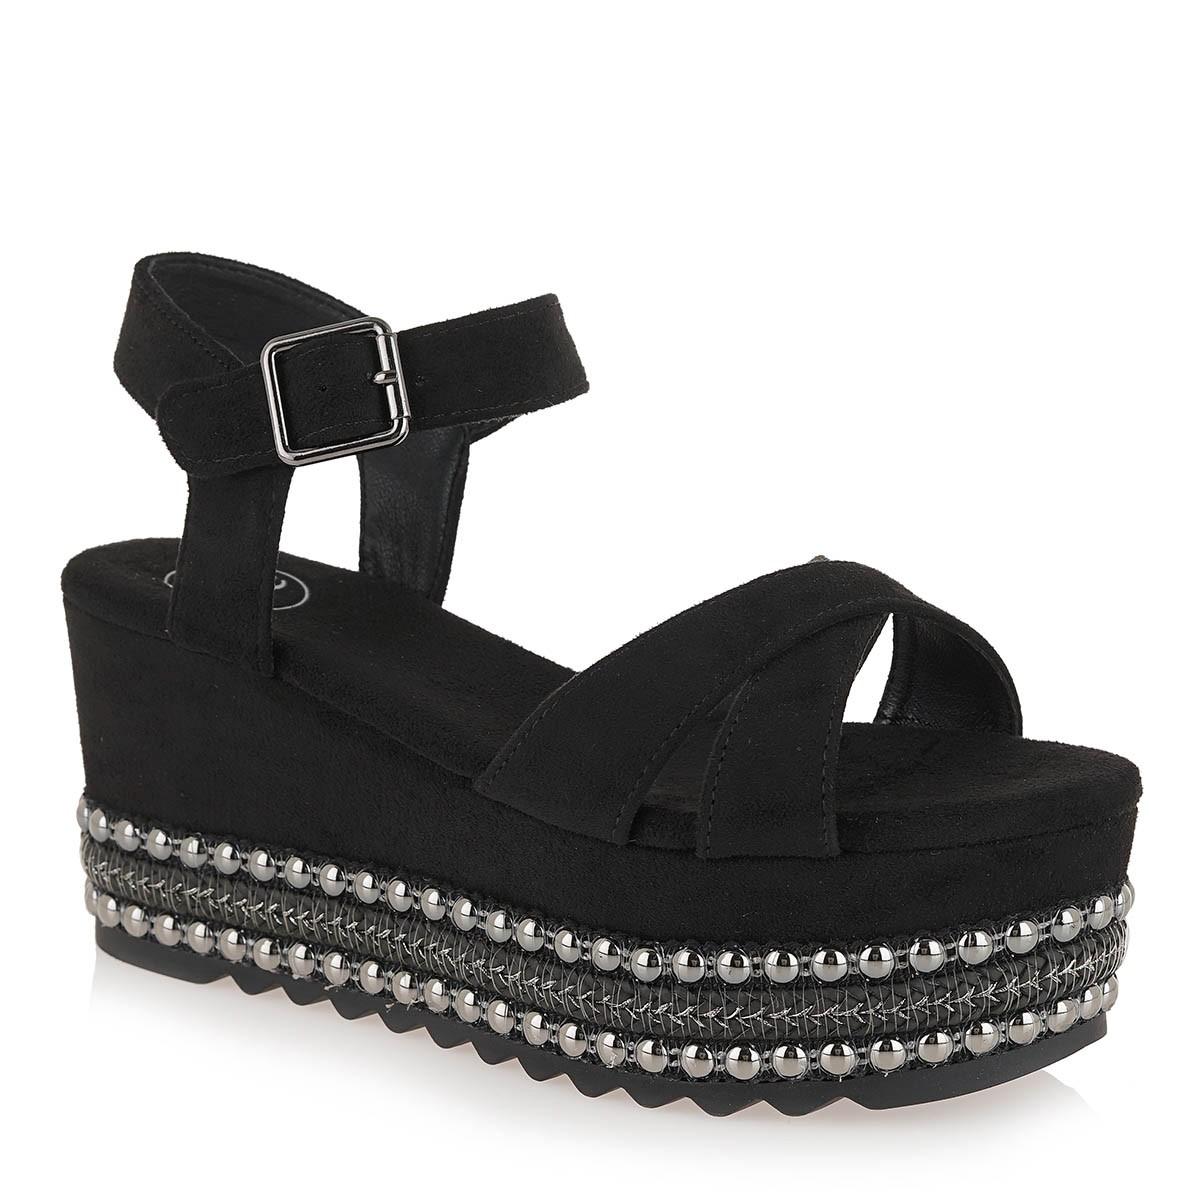 EXE Shoes Γυναικεία Πέδιλα Πλατφόρμες MACAU-716 Μαύρο Ι4700716723